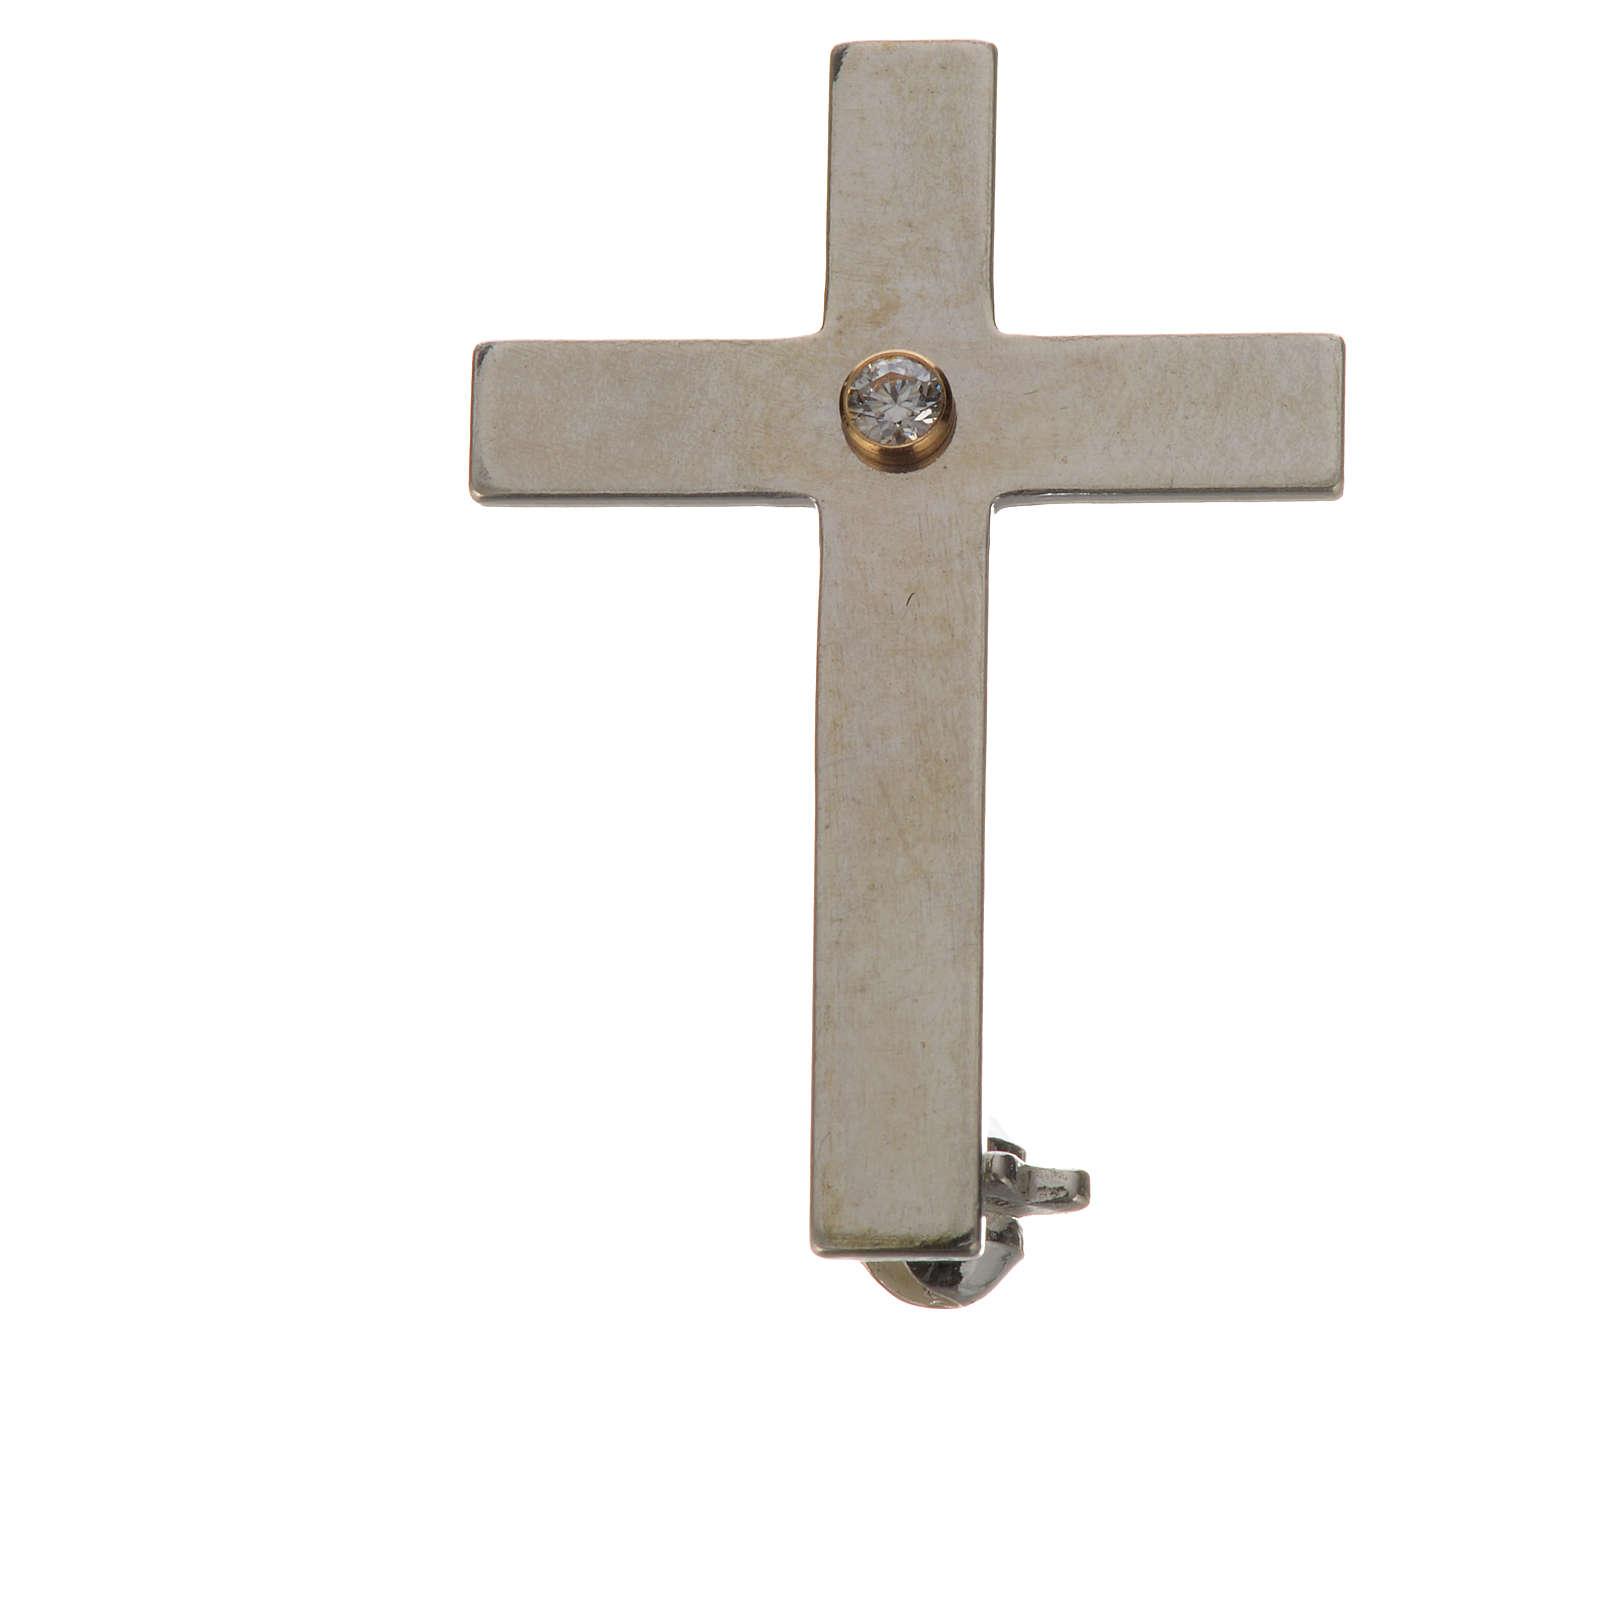 Broszka clergy srebro 925 4